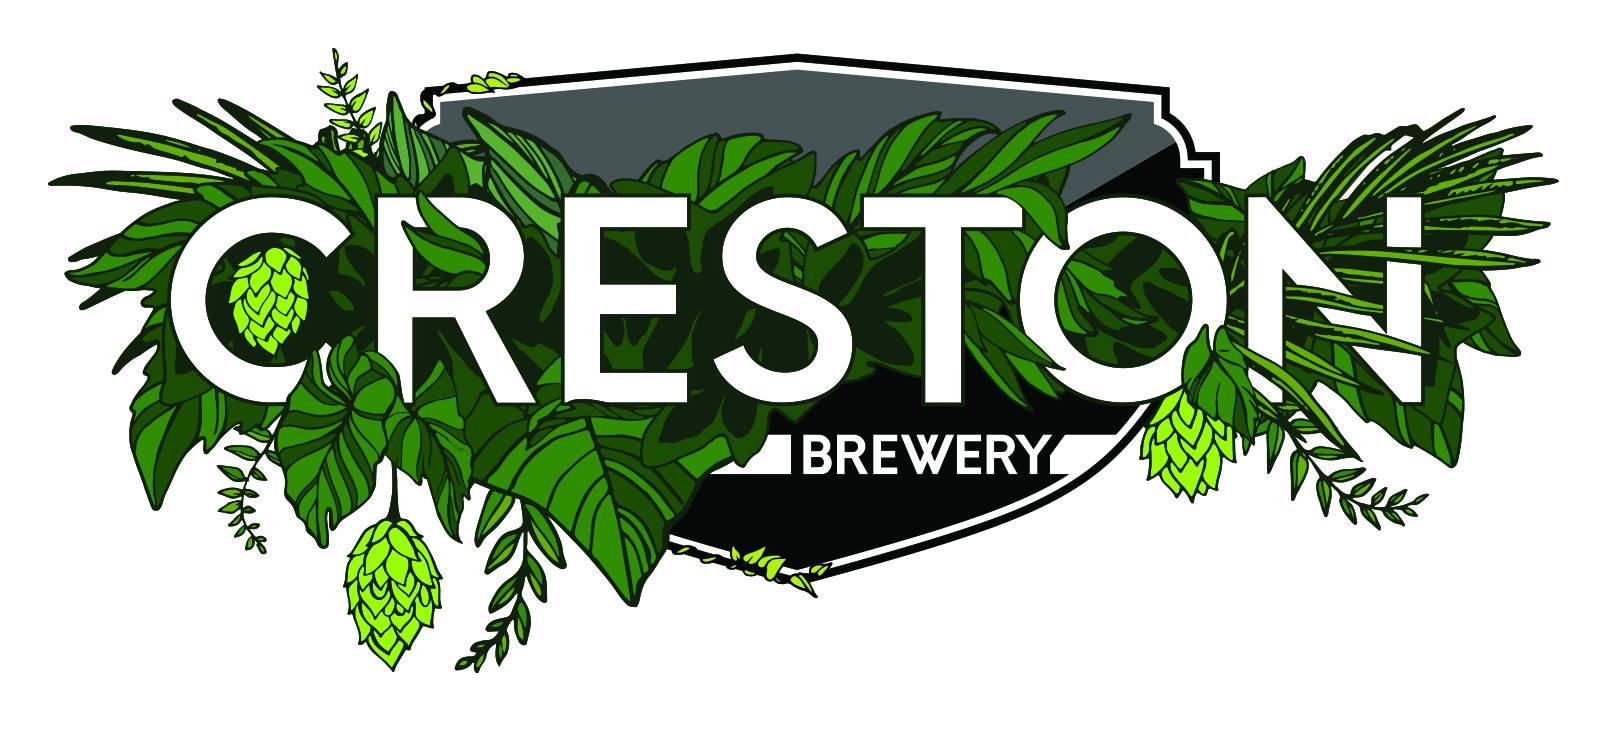 Creston_logo_full.jpg